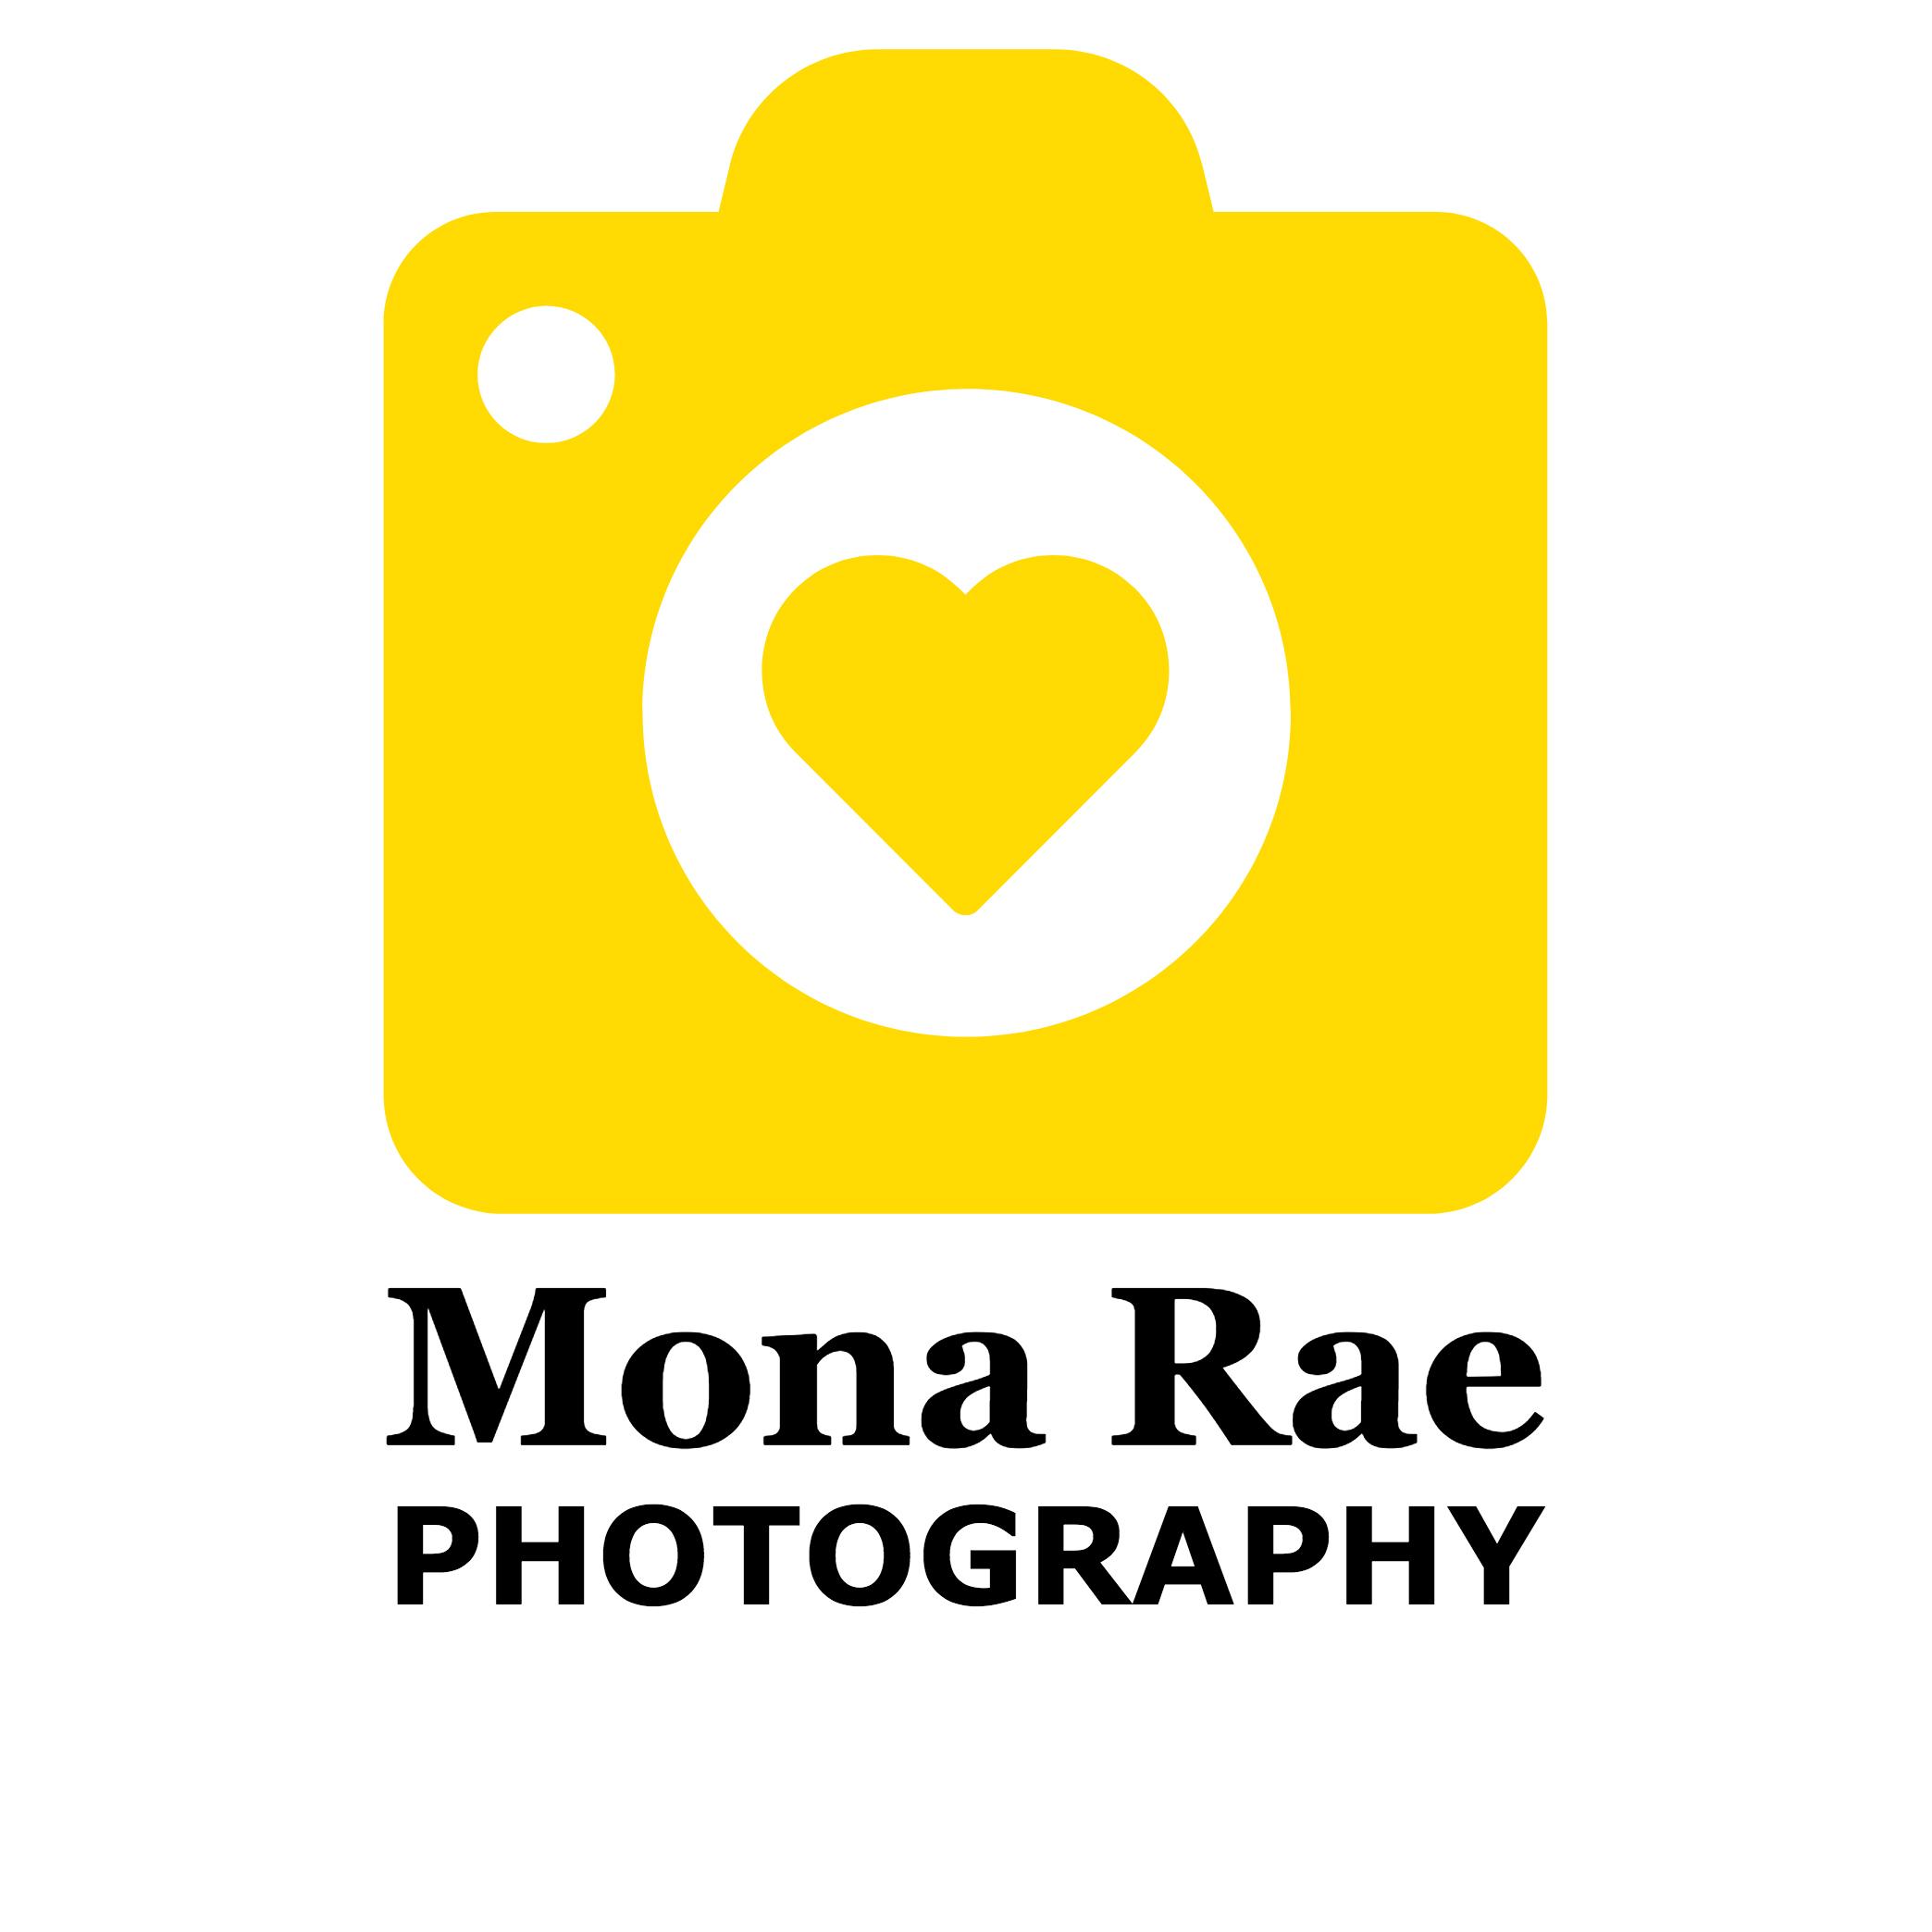 Mona Rae-logo (2) square instagram profile pic.jpg